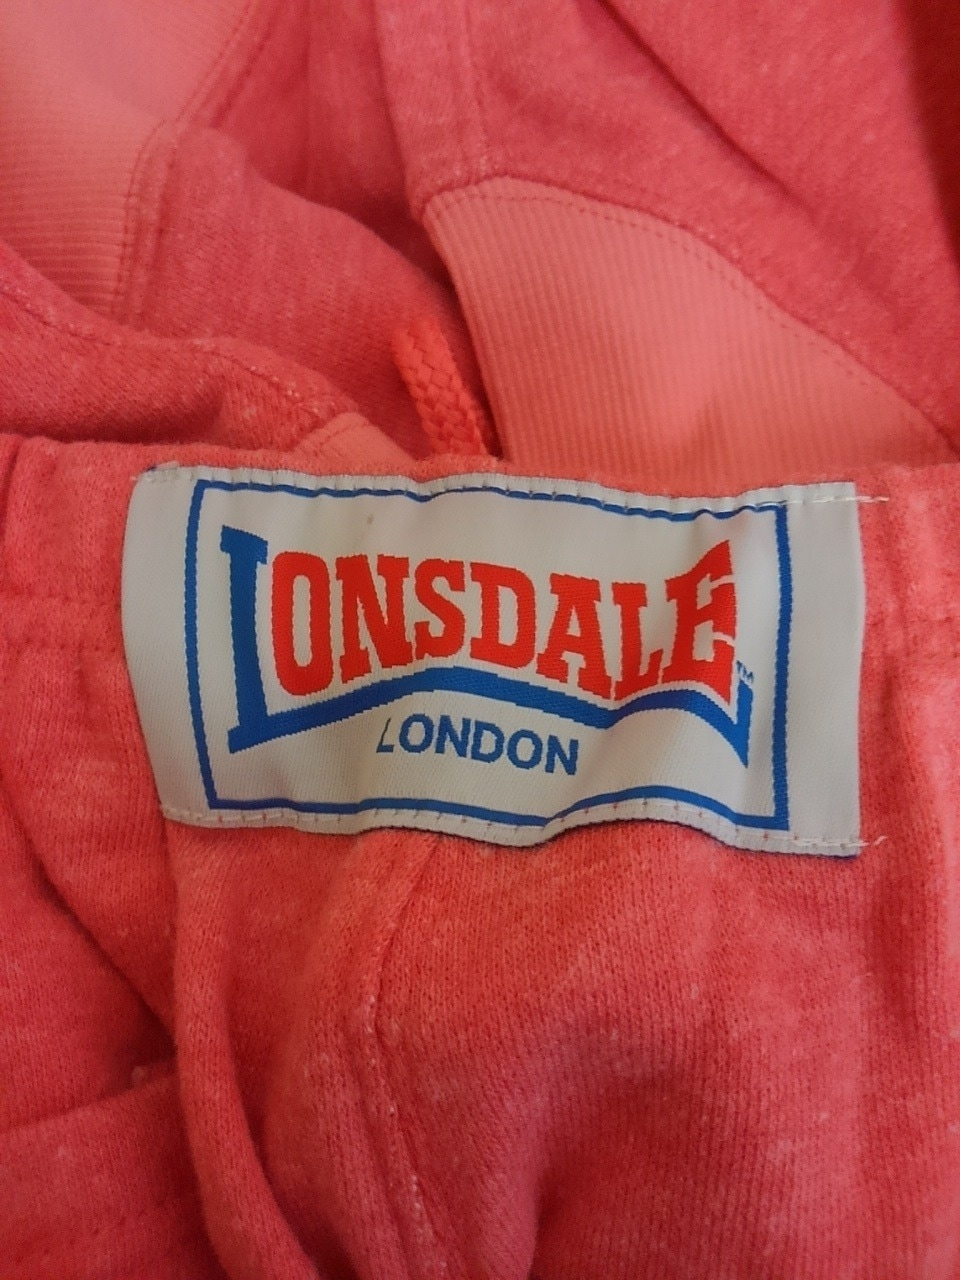 LONSDALE(ロンズデール)のメンズセットアップ